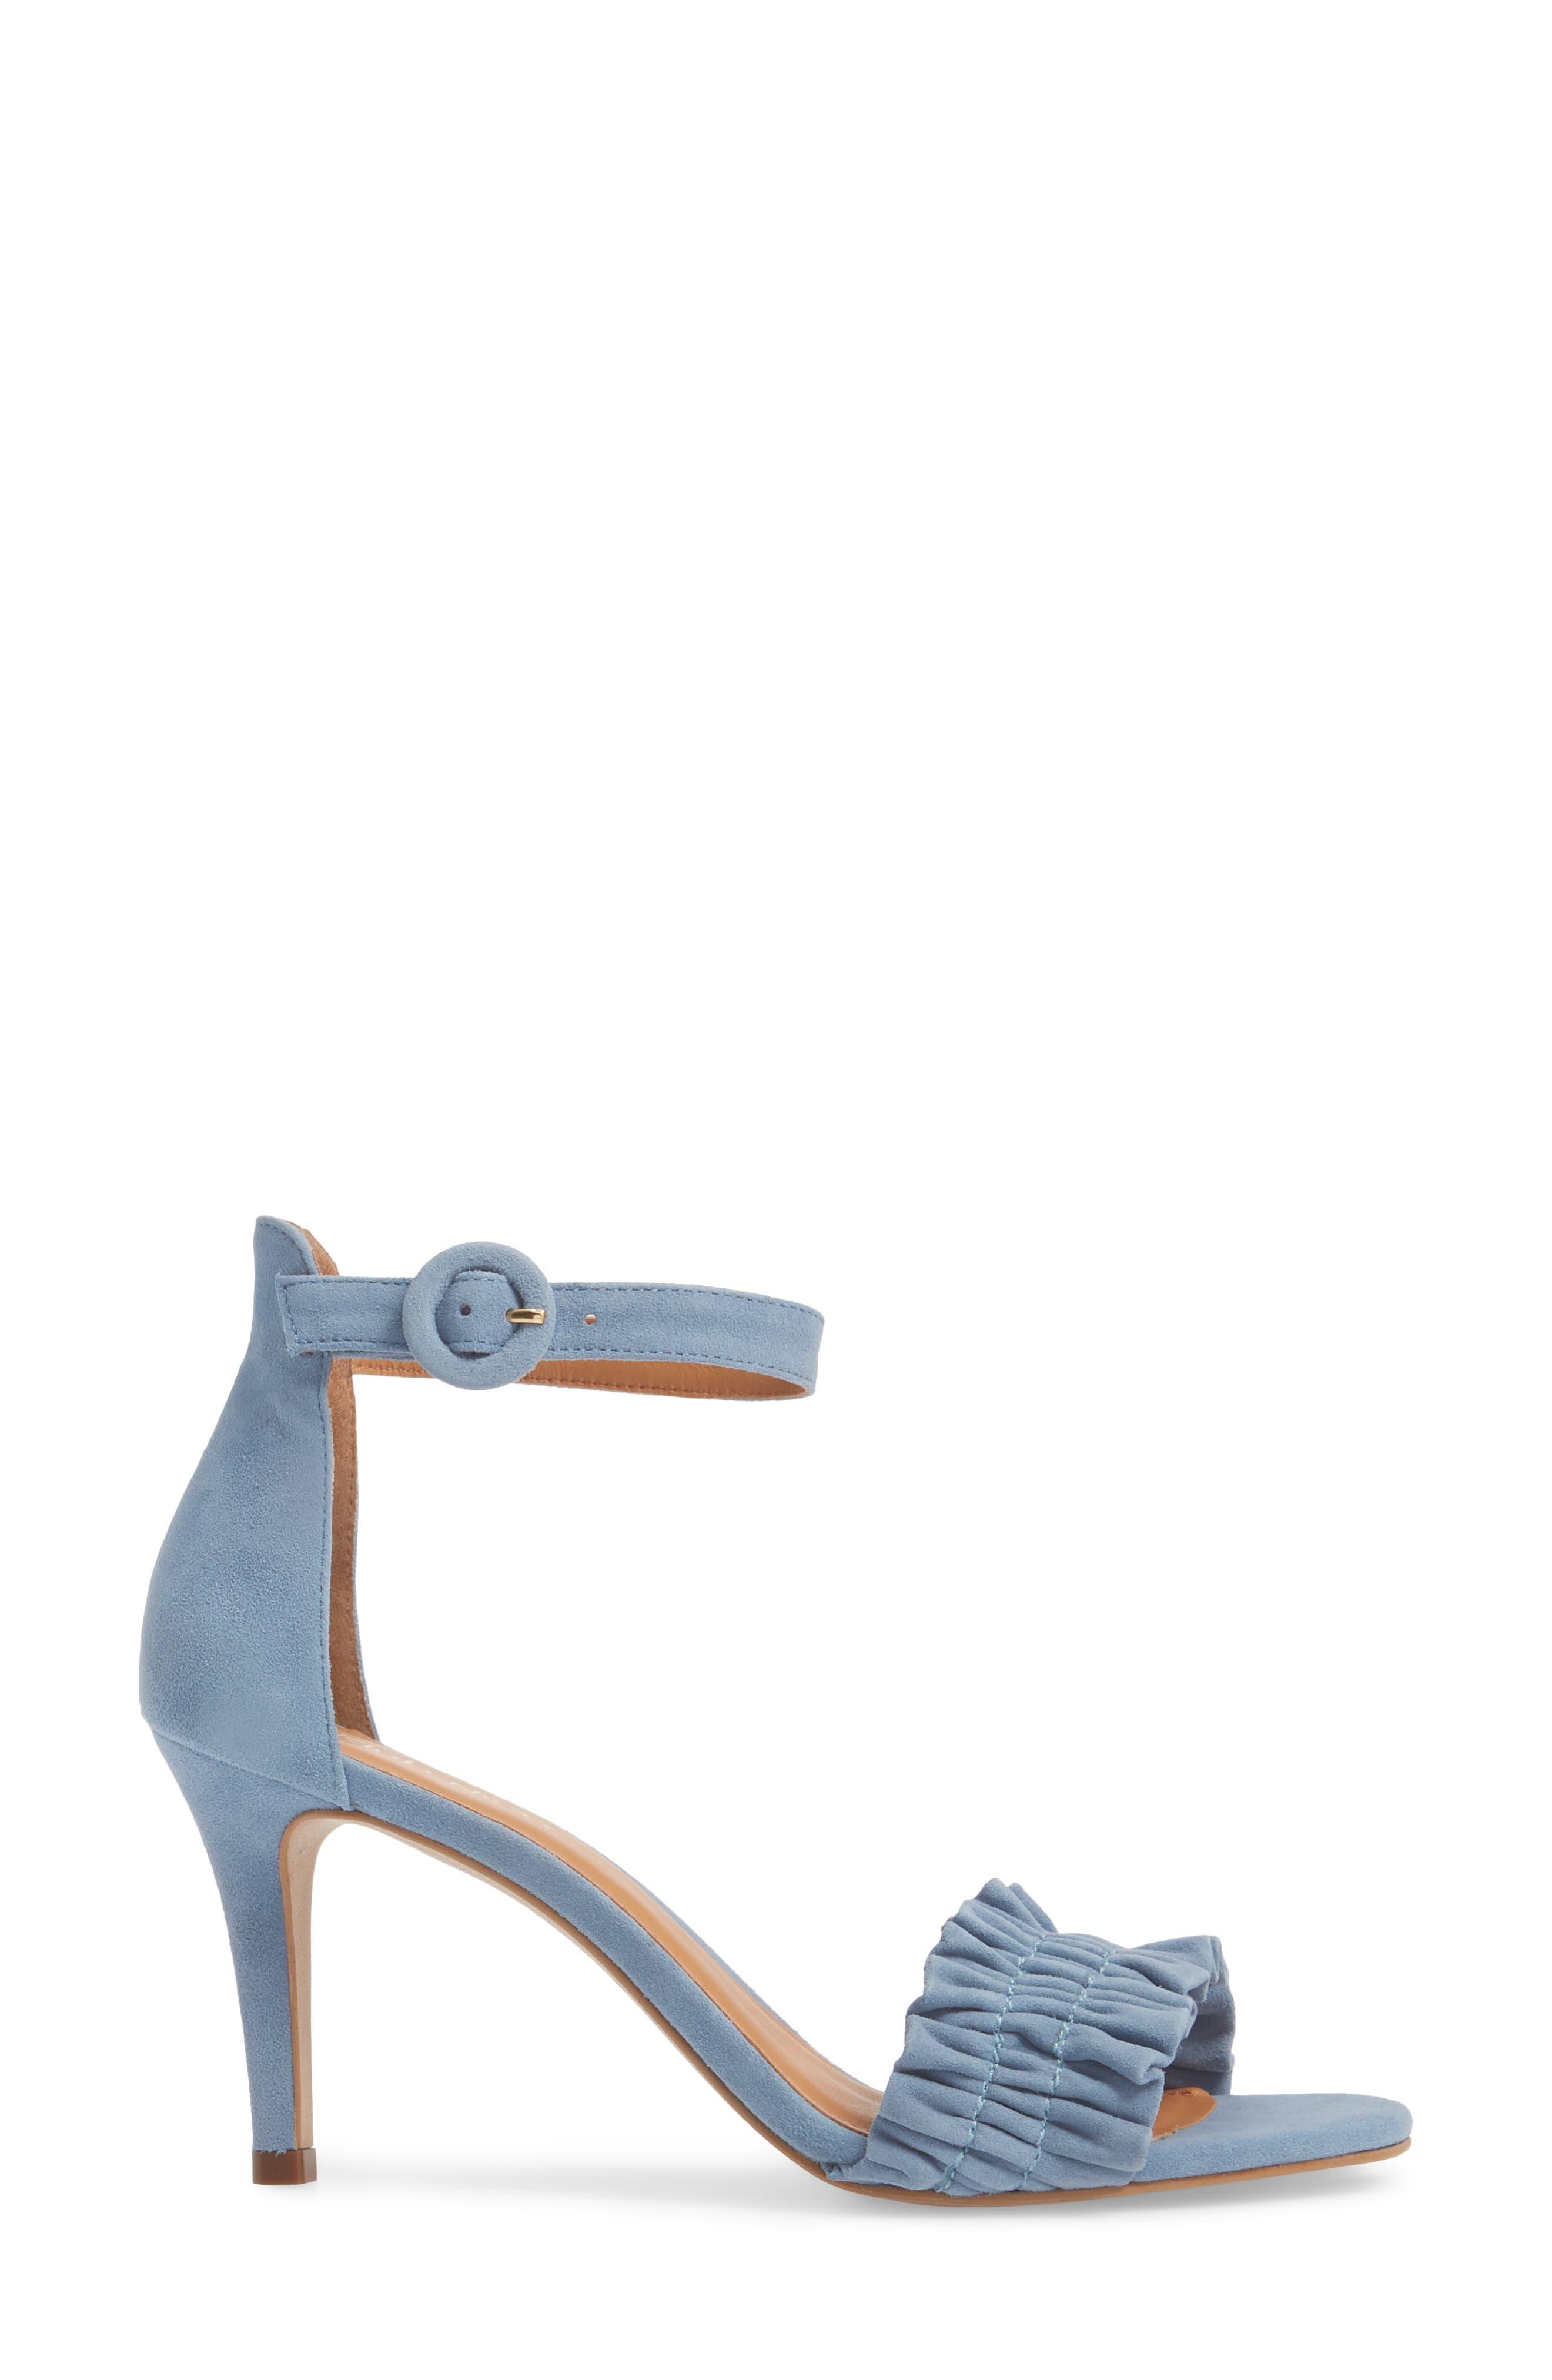 Arlow Sandal,                             Alternate thumbnail 3, color,                             BLUE LEATHER